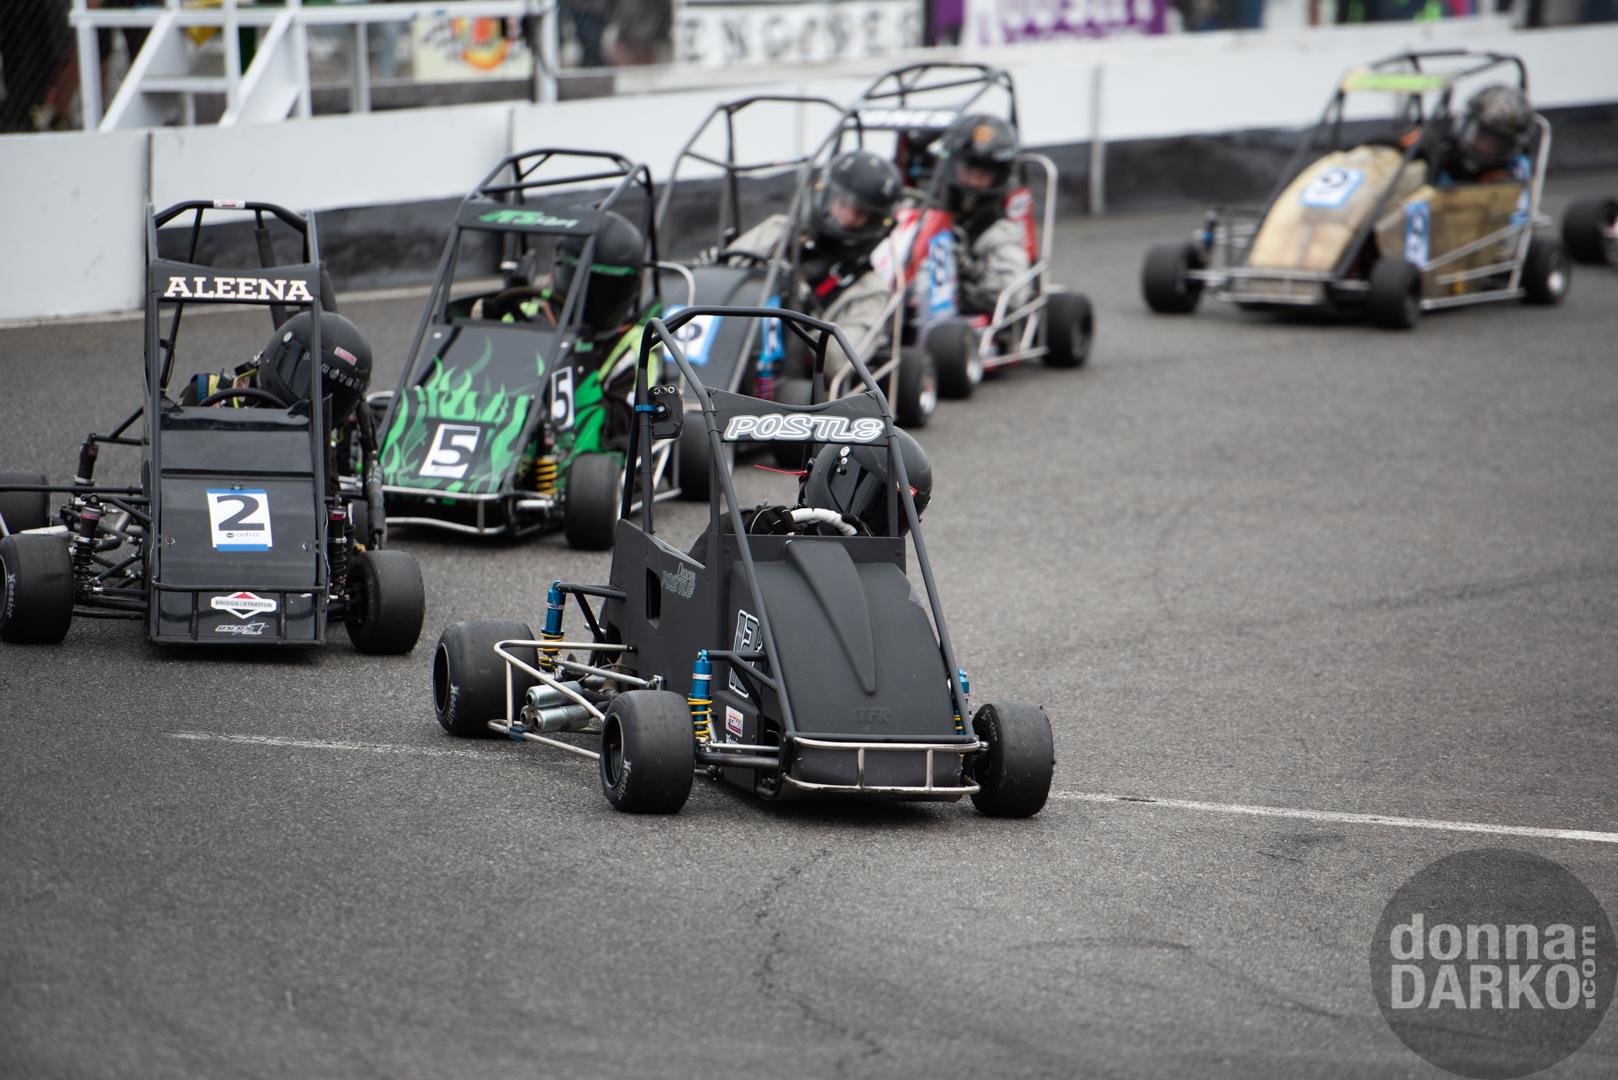 QWMA (Racing) 8-11-2019 DSC_6616.jpg